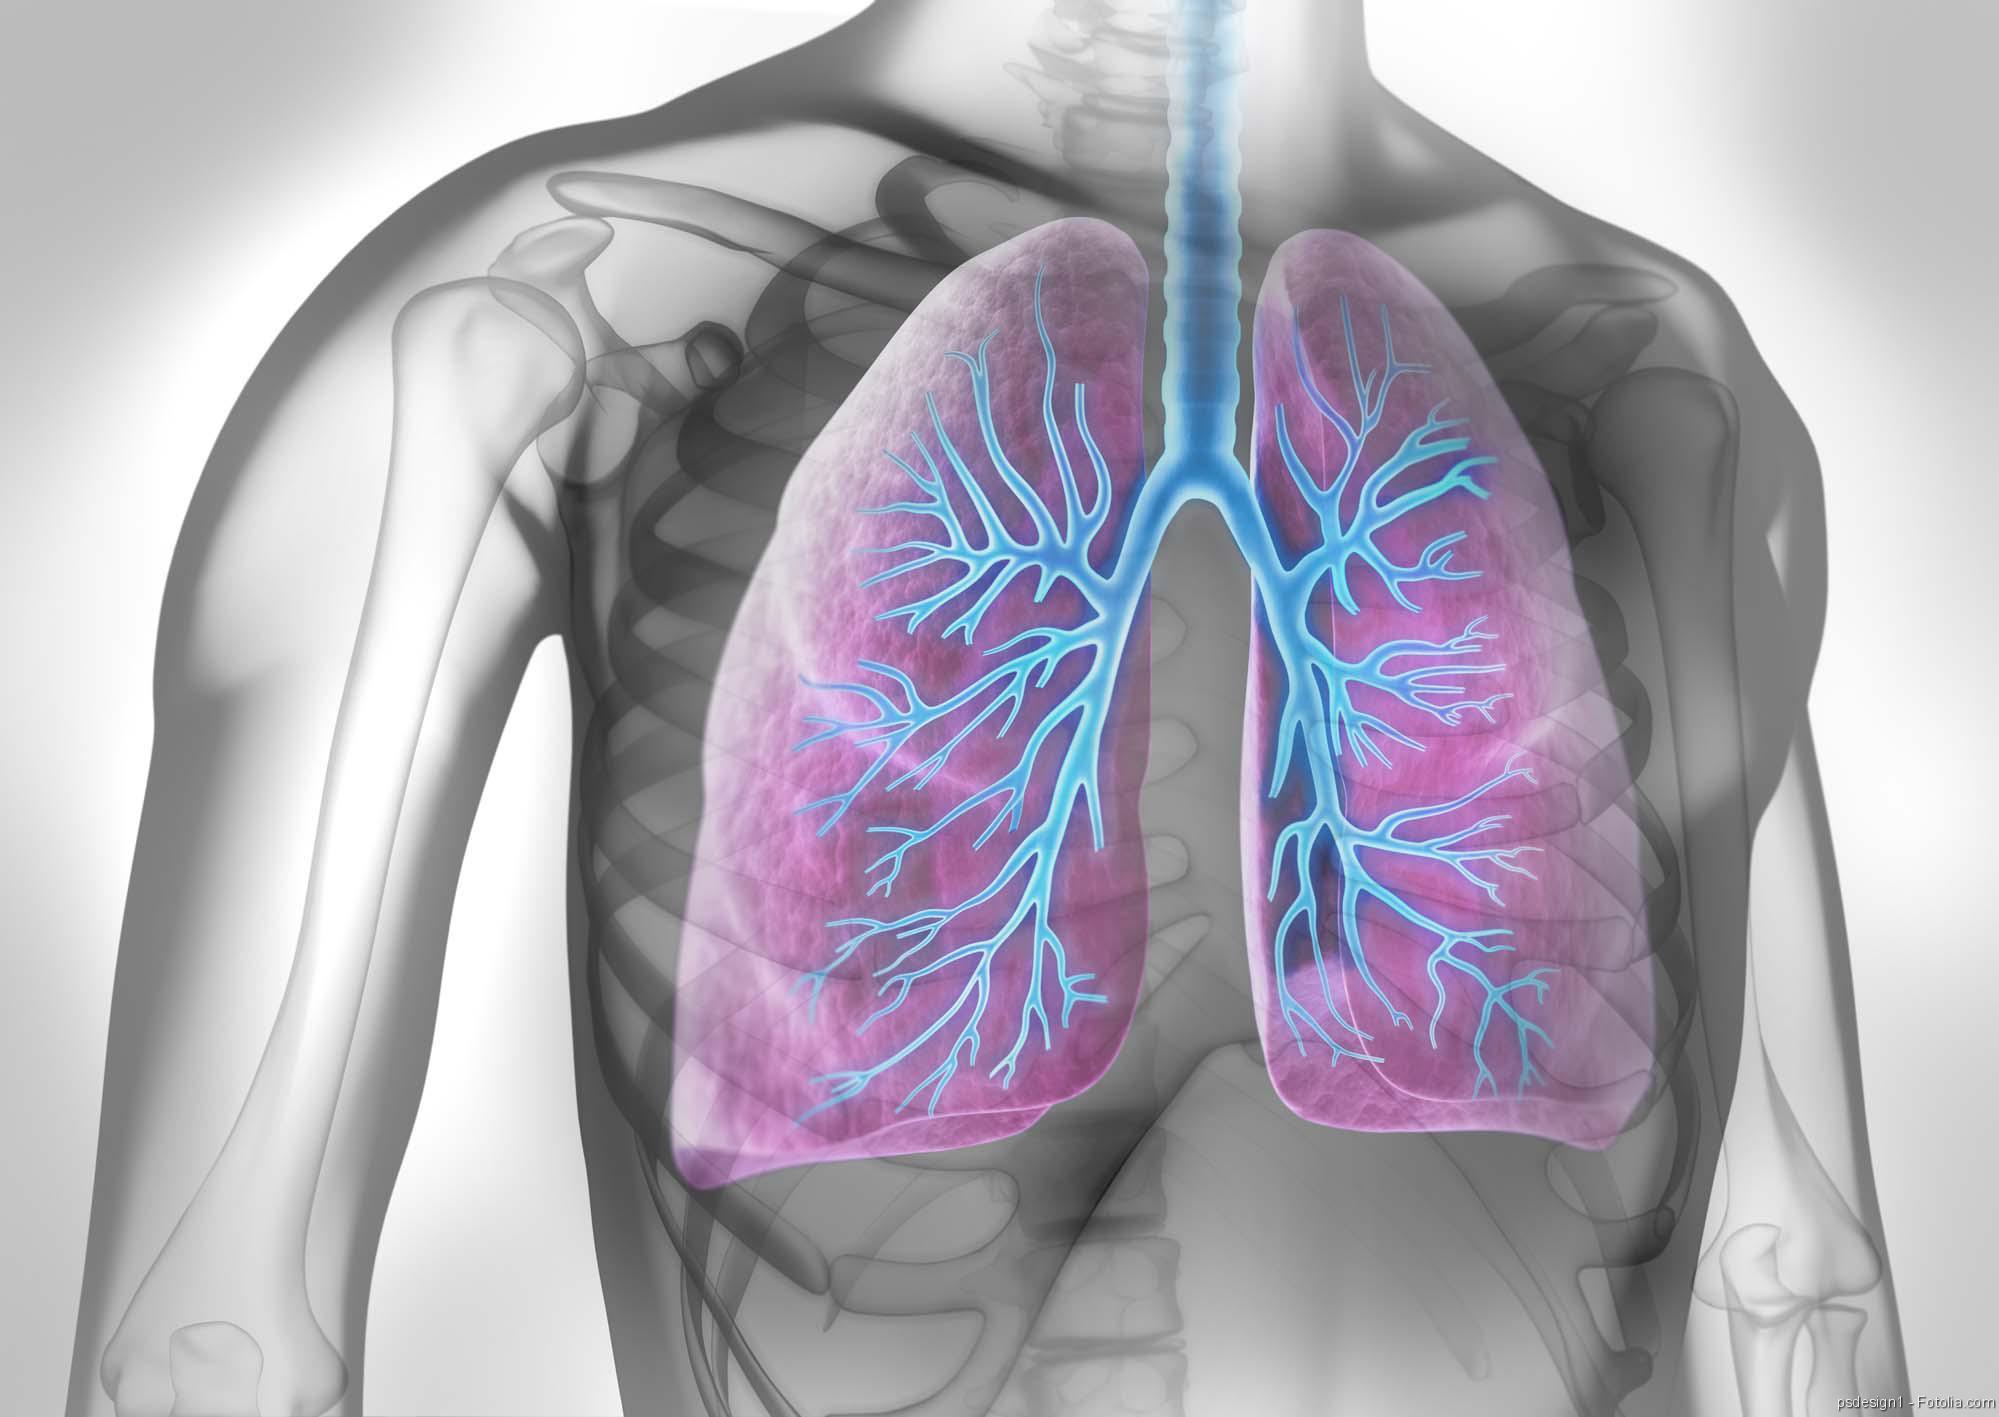 Lungenerkrankung, Lungenkrebs, Lungenentzündung, Schweres Asthma, Schimmel